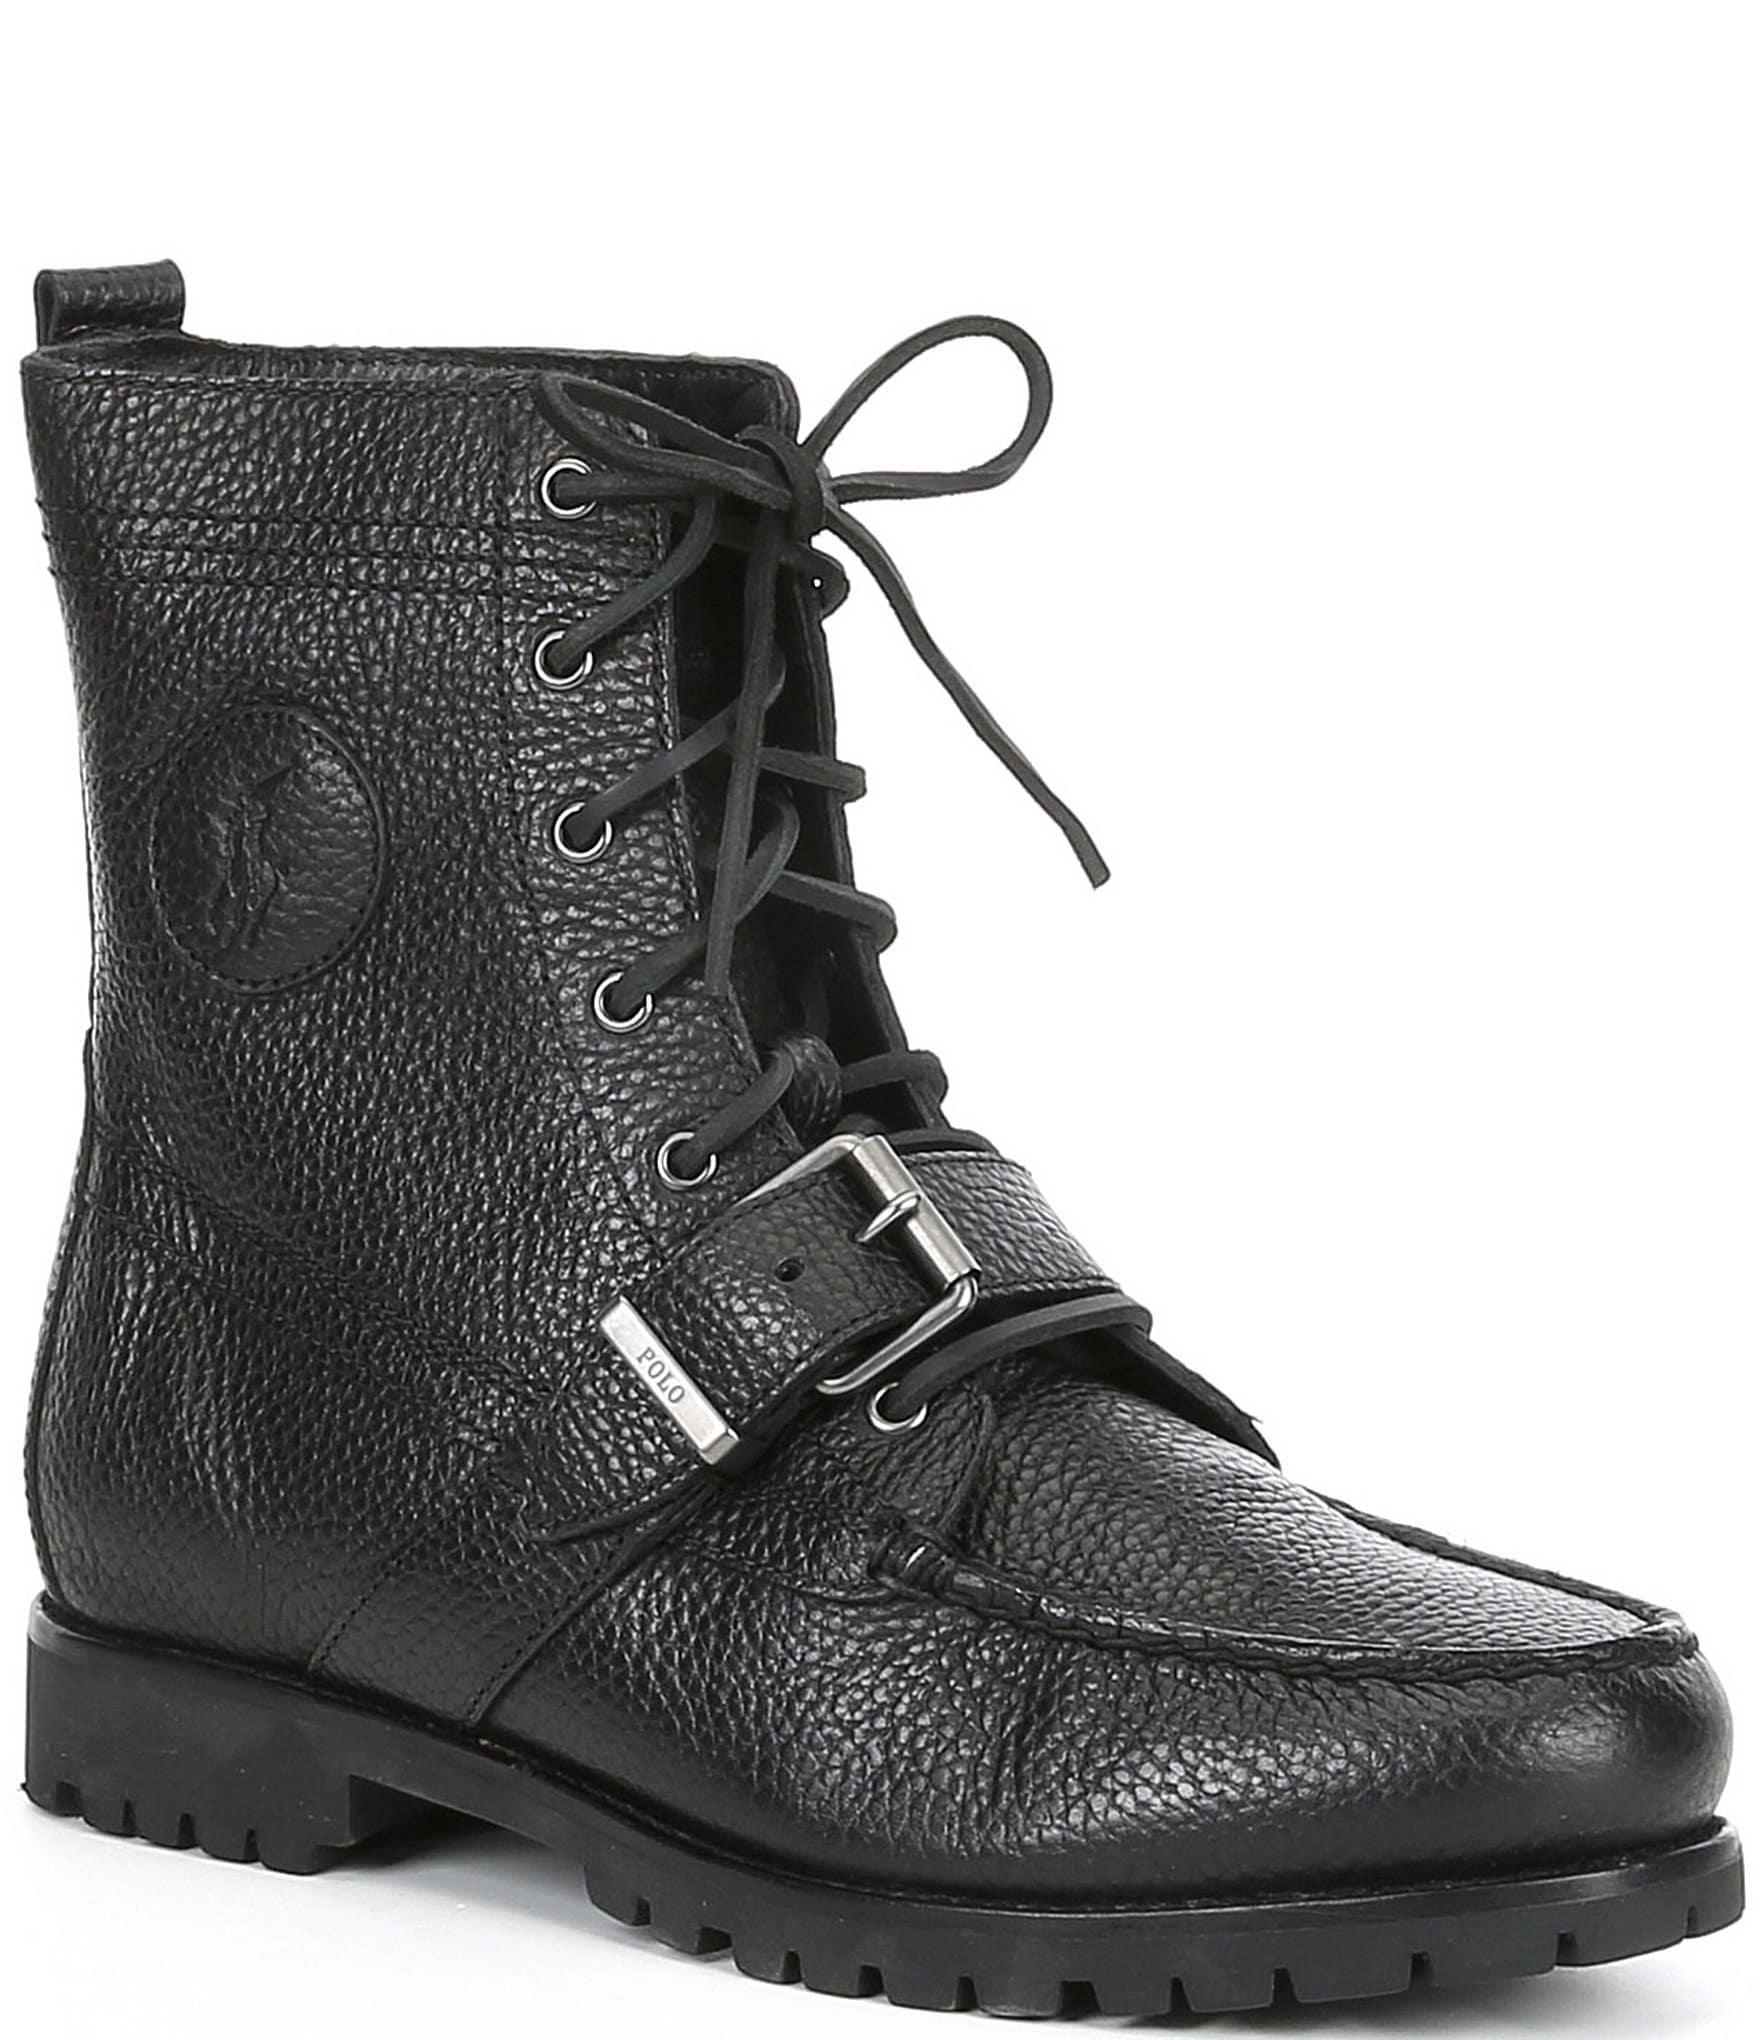 0dfaa0bac6c Polo Ralph Lauren Men's Ranger Leather Buckle Boots | Dillard's